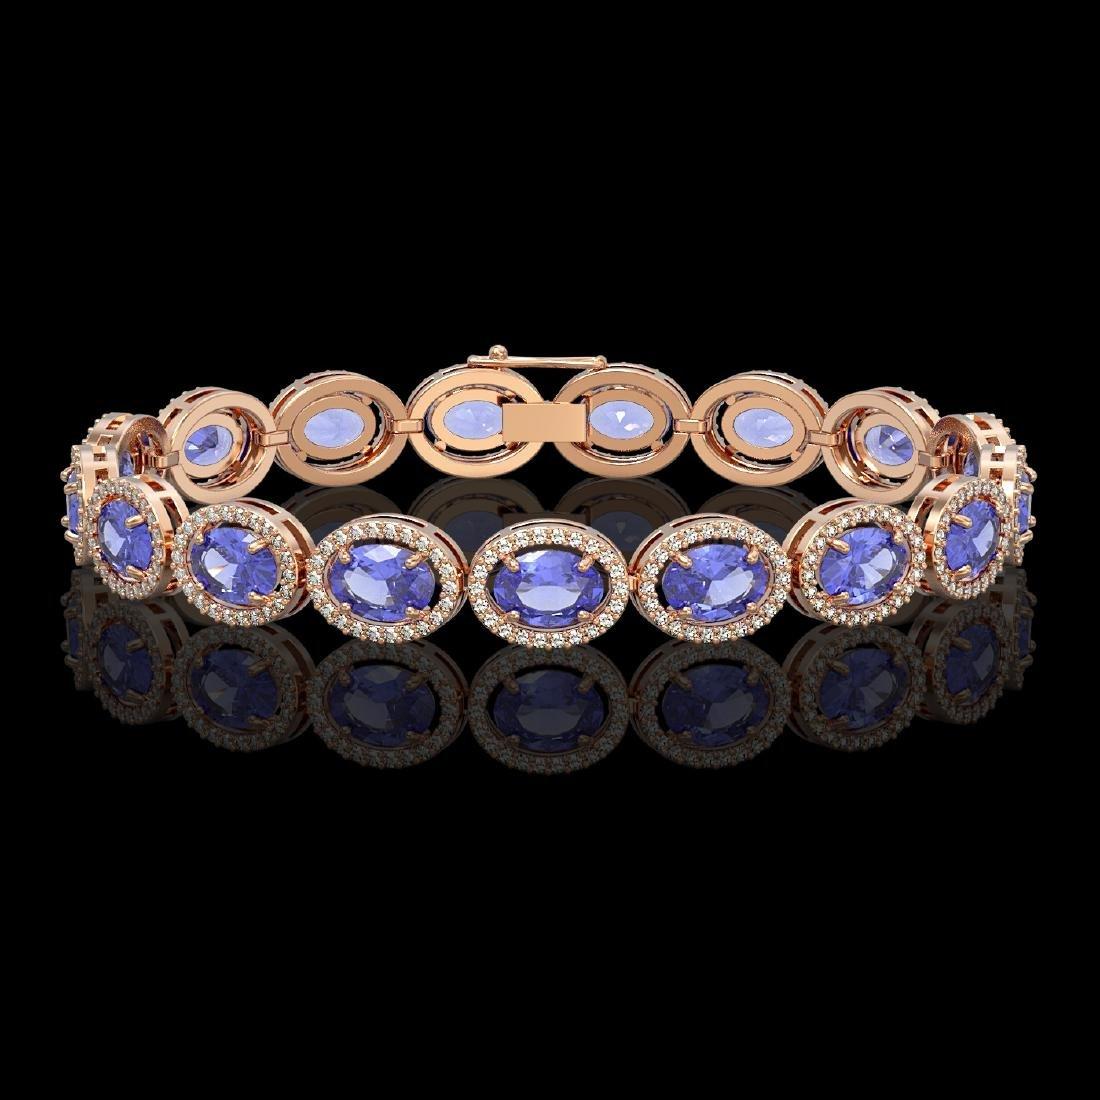 21.35 CTW Tanzanite & Diamond Halo Bracelet 10K Rose